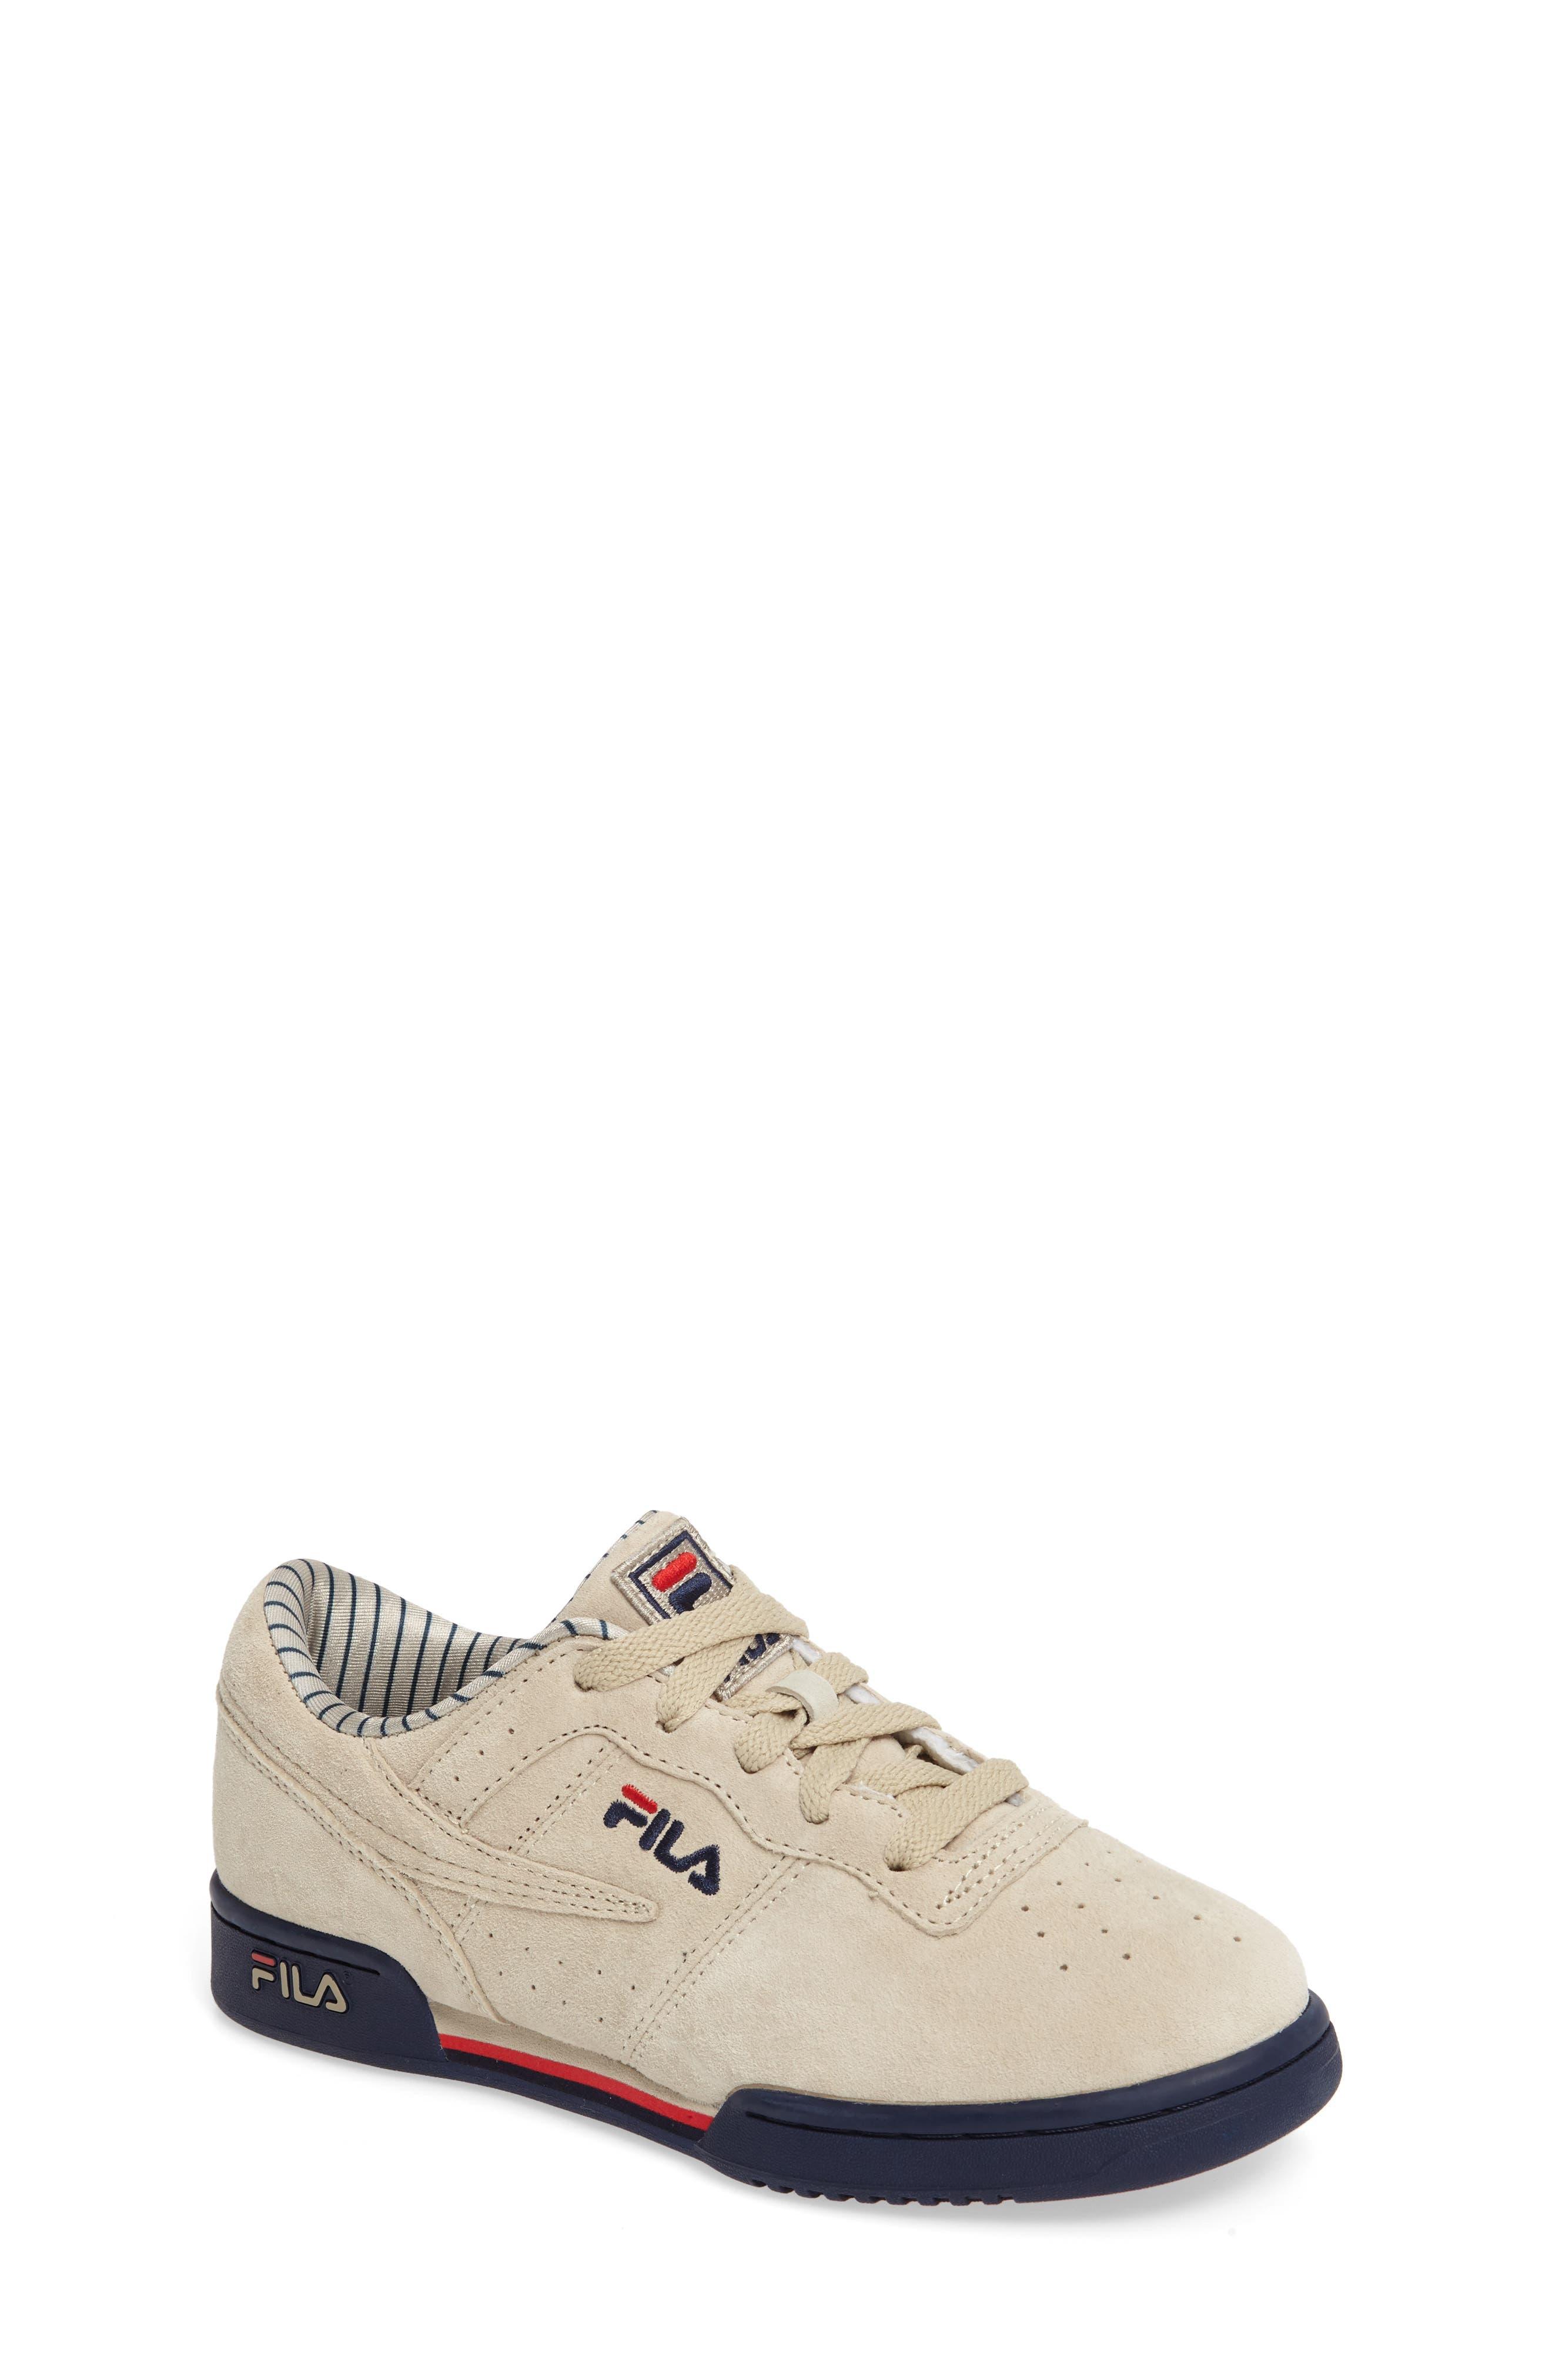 FILA,                             Original Fitness Sneaker,                             Main thumbnail 1, color,                             900